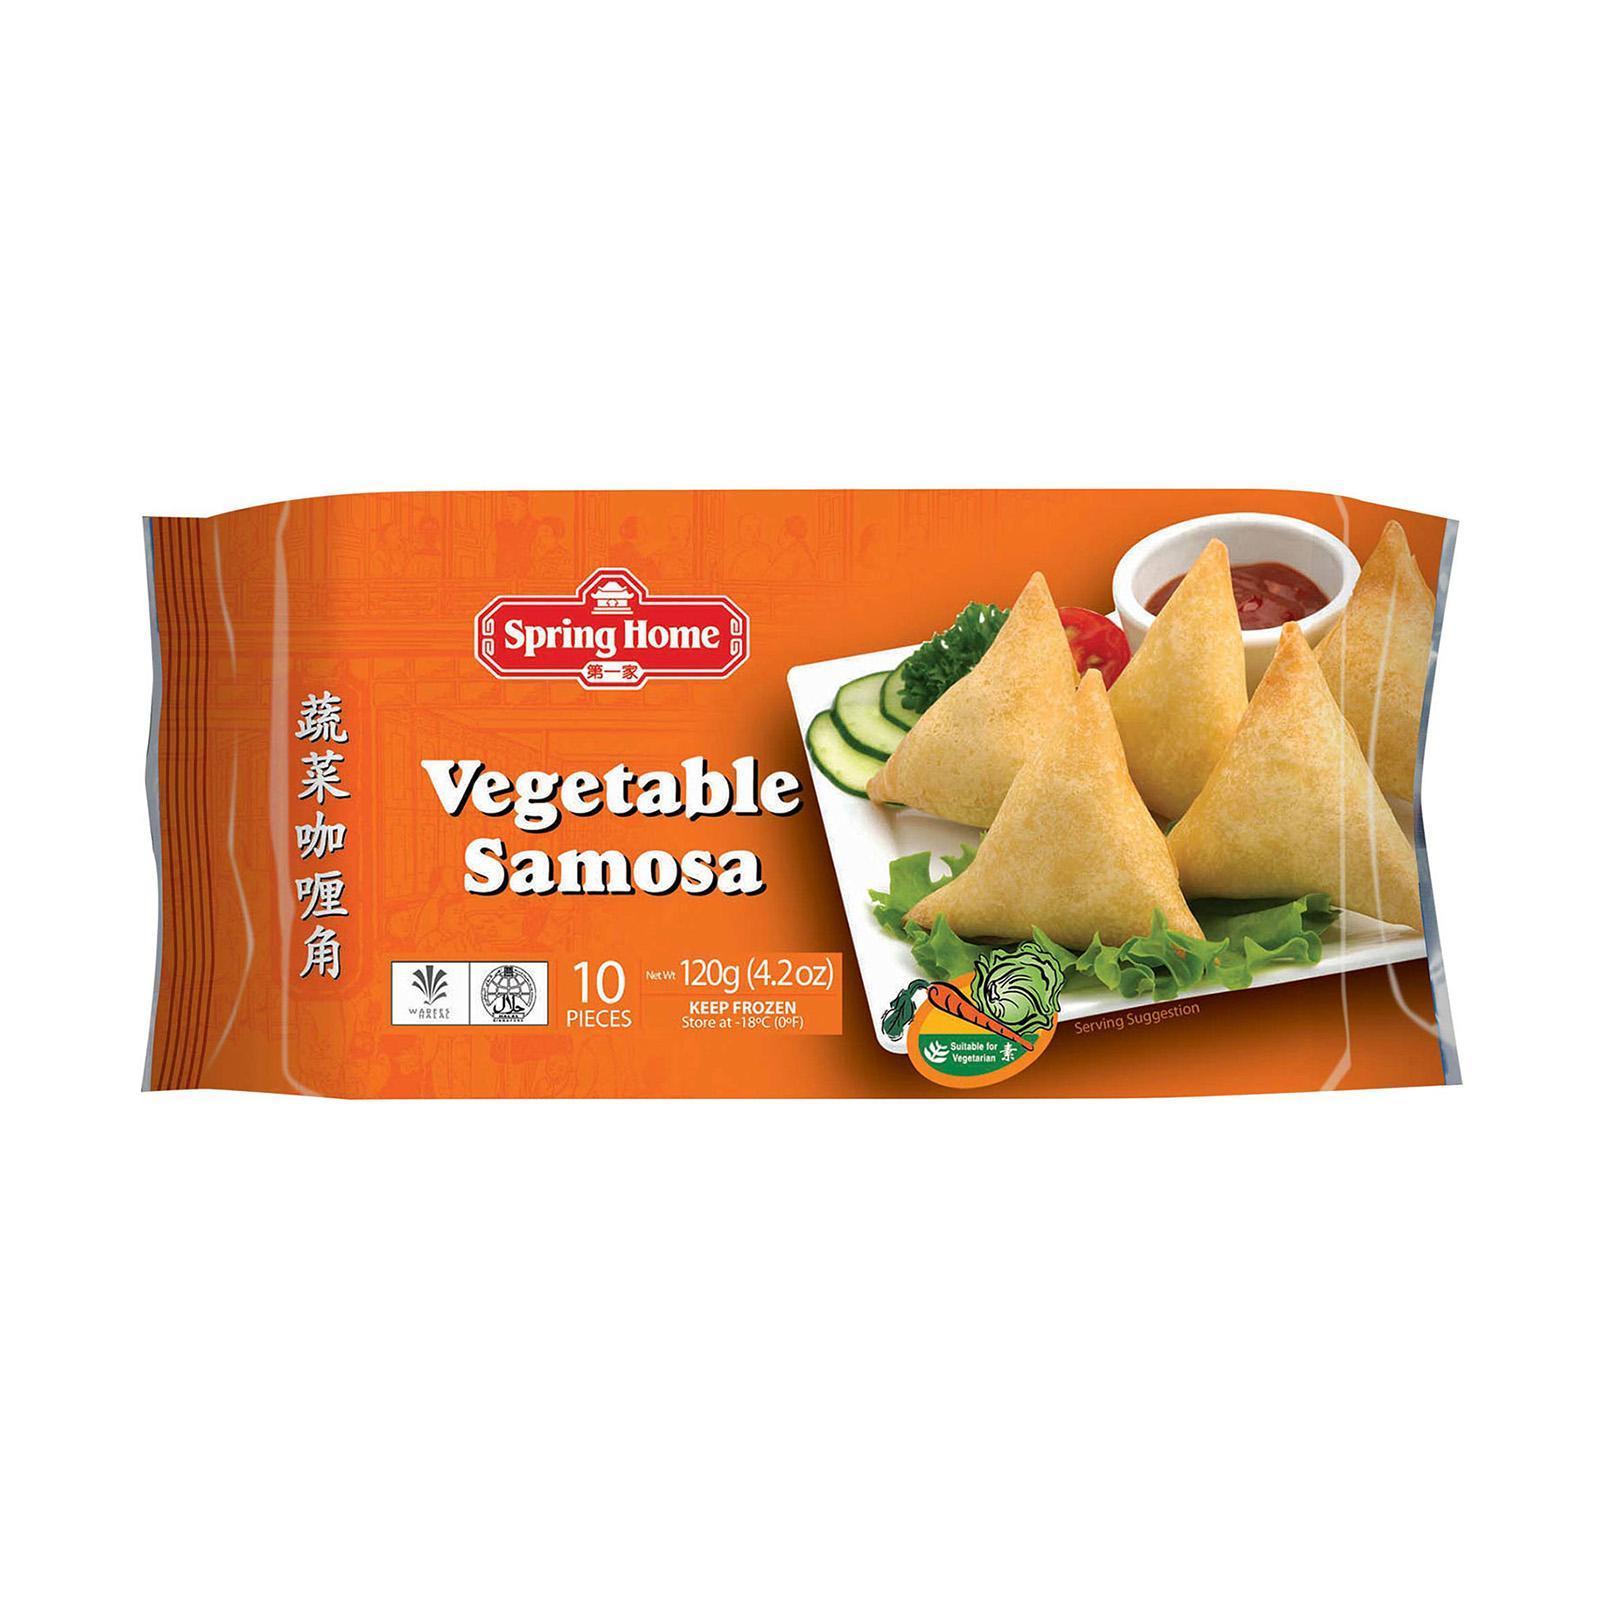 Spring Home Vegetable Samosas (10 Pcs) - Frozen